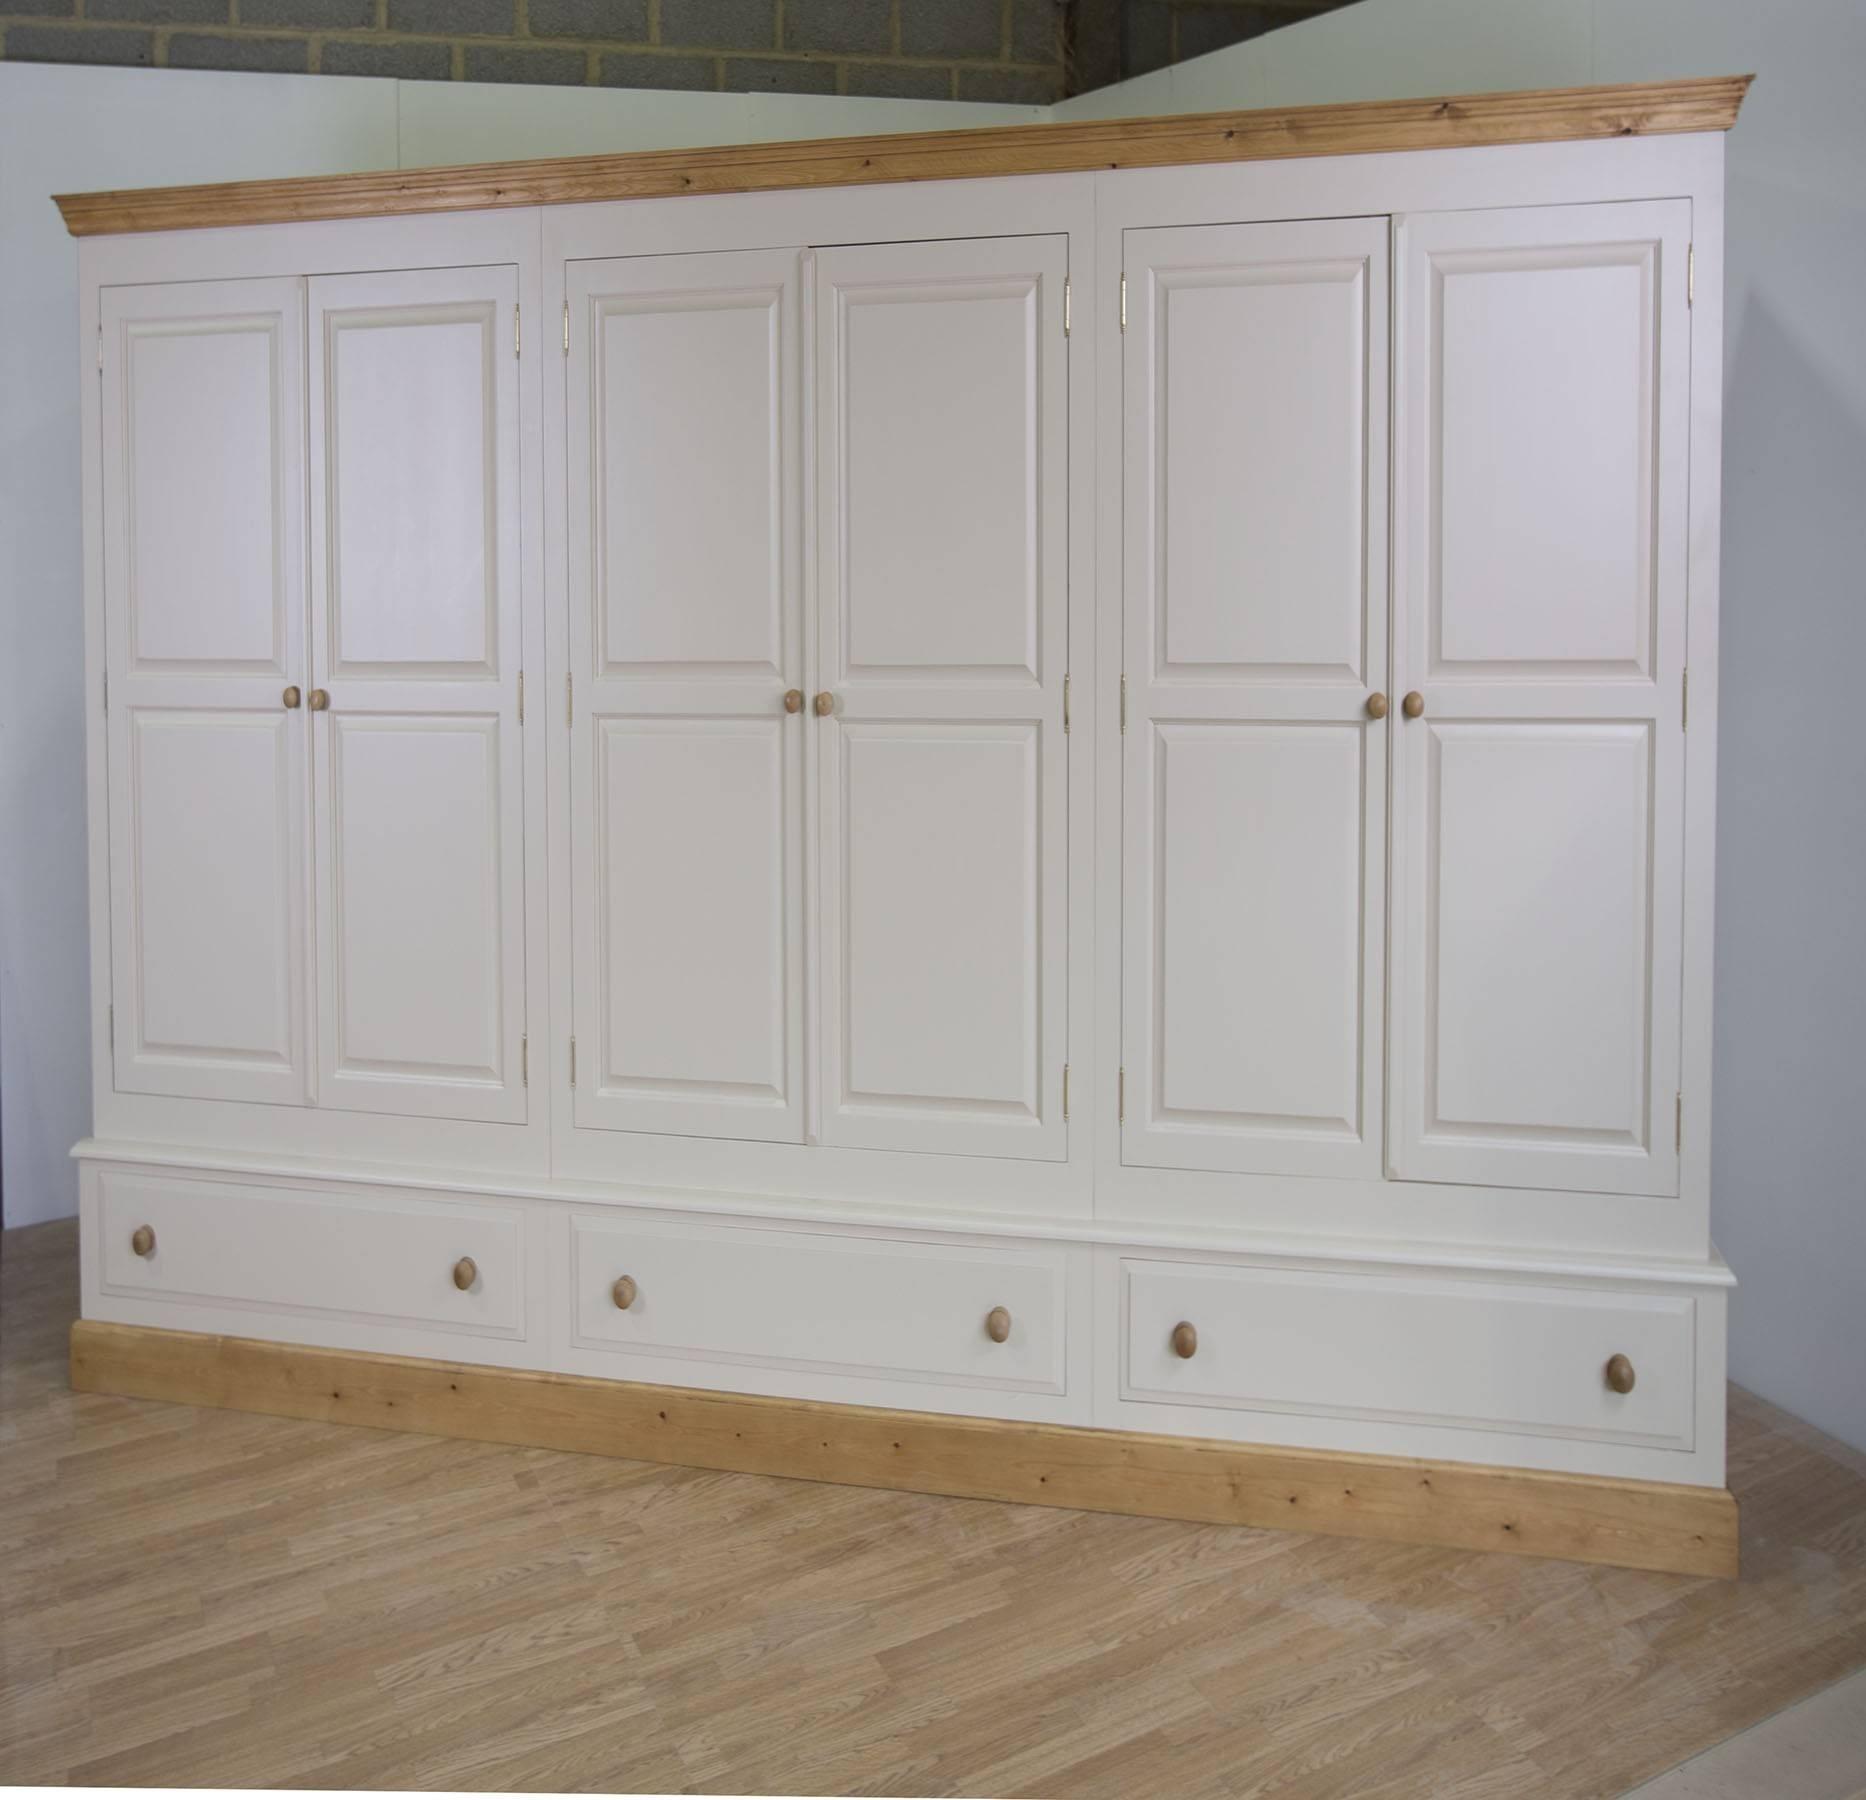 Farrow & Ball Painted Large 6 Door Wardrobe With Drawers regarding White Pine Wardrobes (Image 6 of 15)